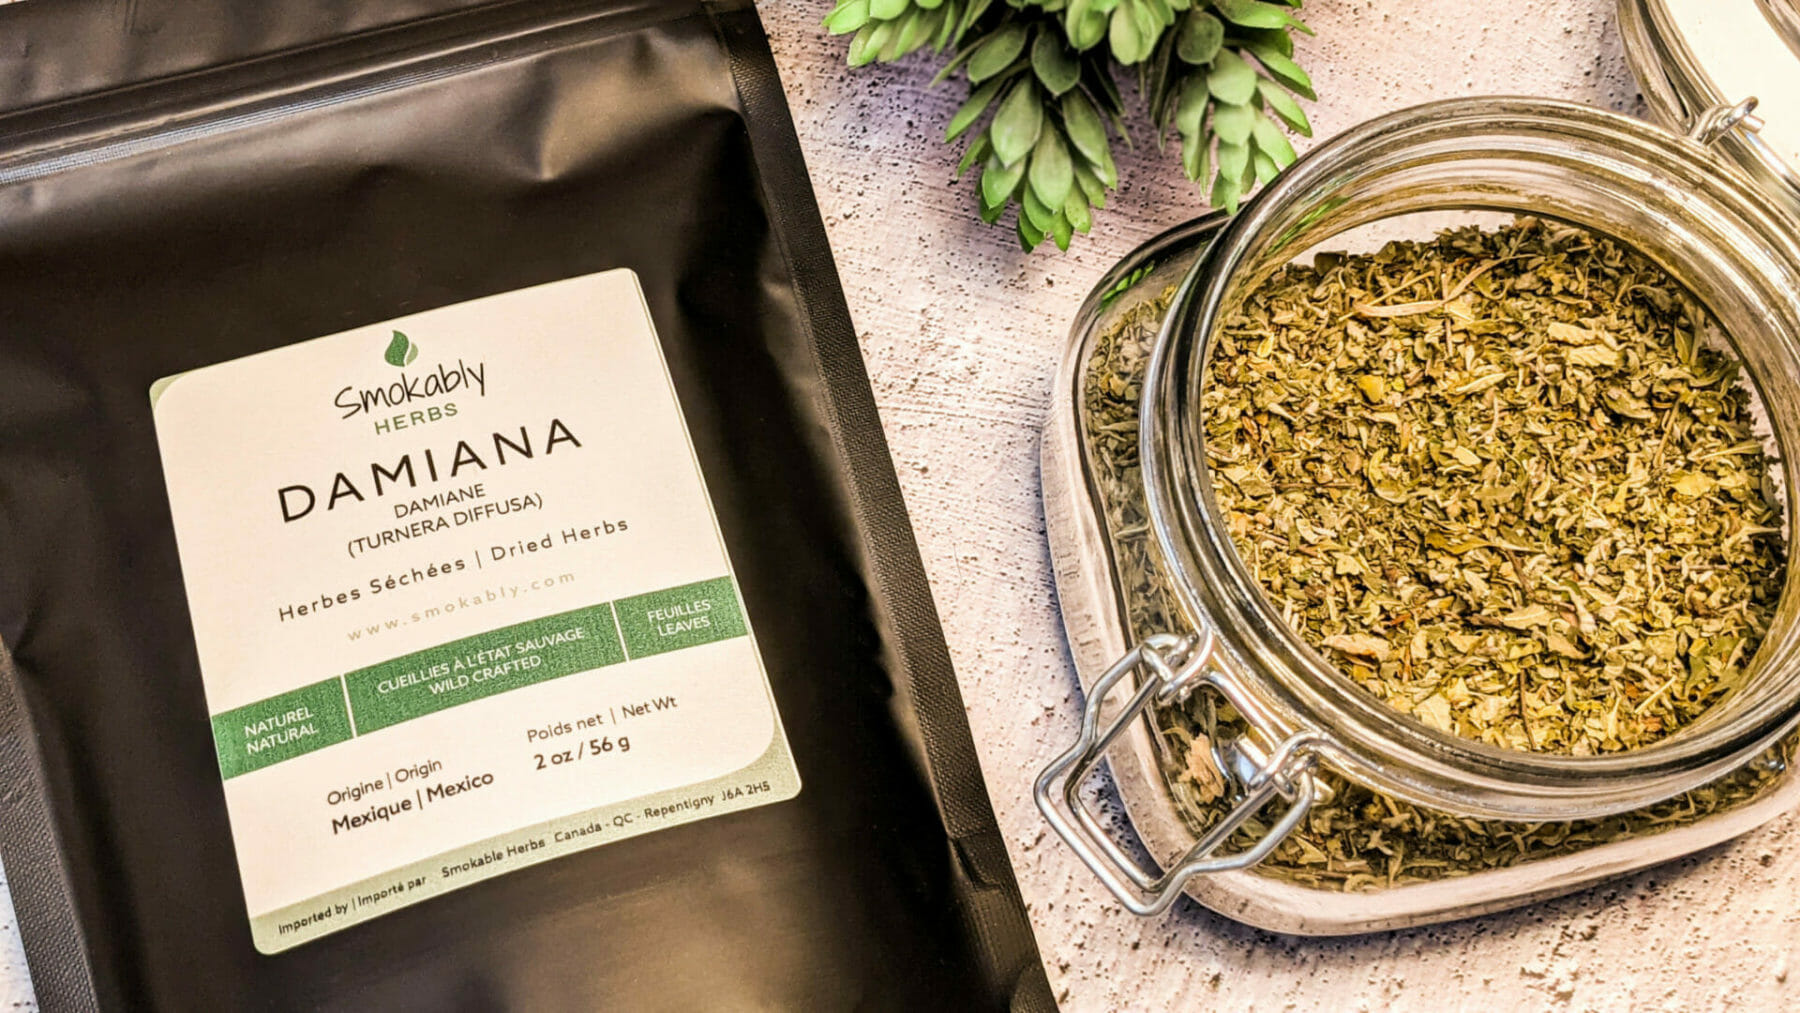 Damiana dried herb product